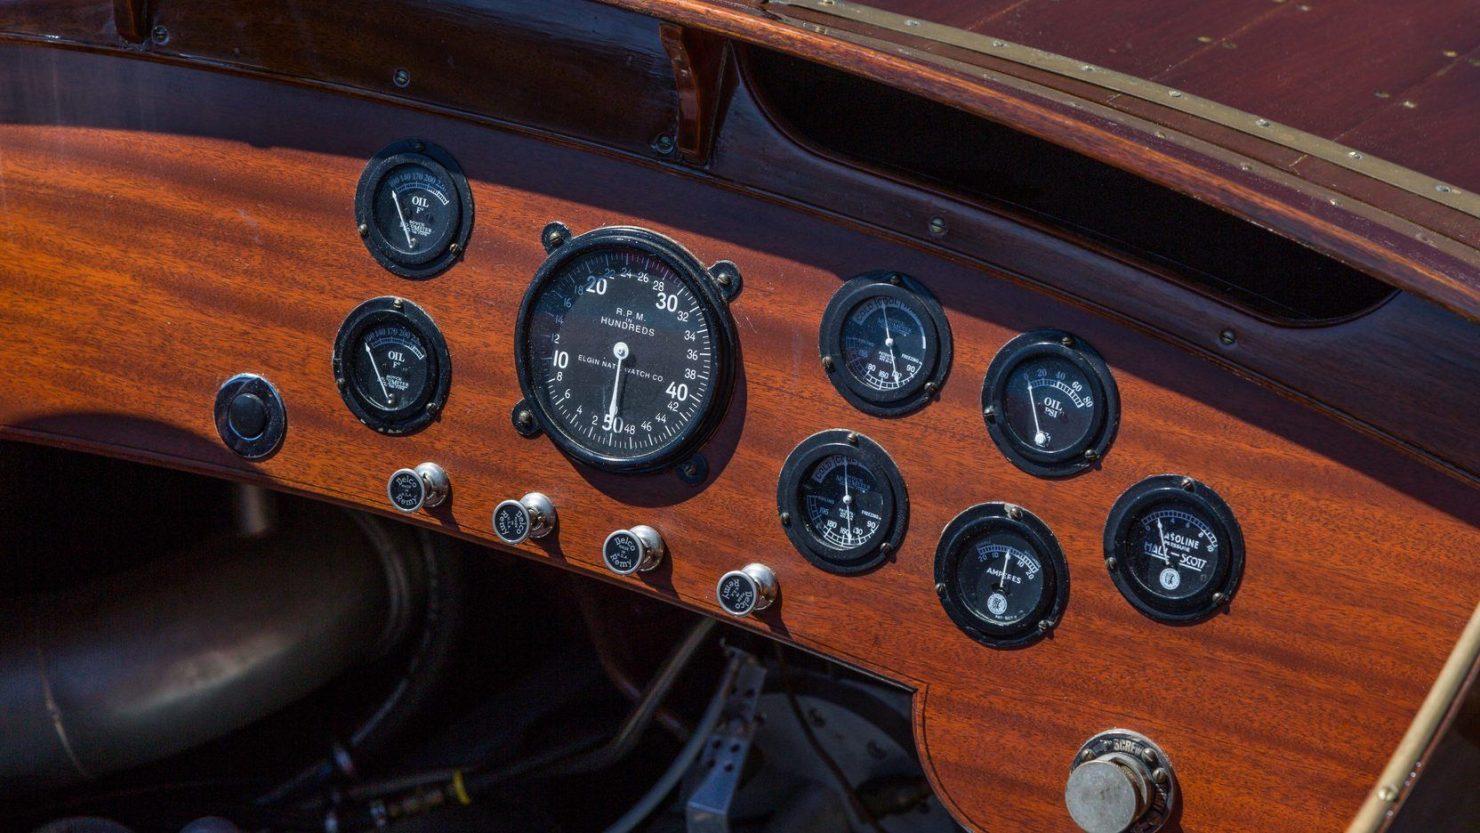 mahogany speed boat 2 1480x833 - 27 Liter V12 Brown & Bassett Gentleman's Racer